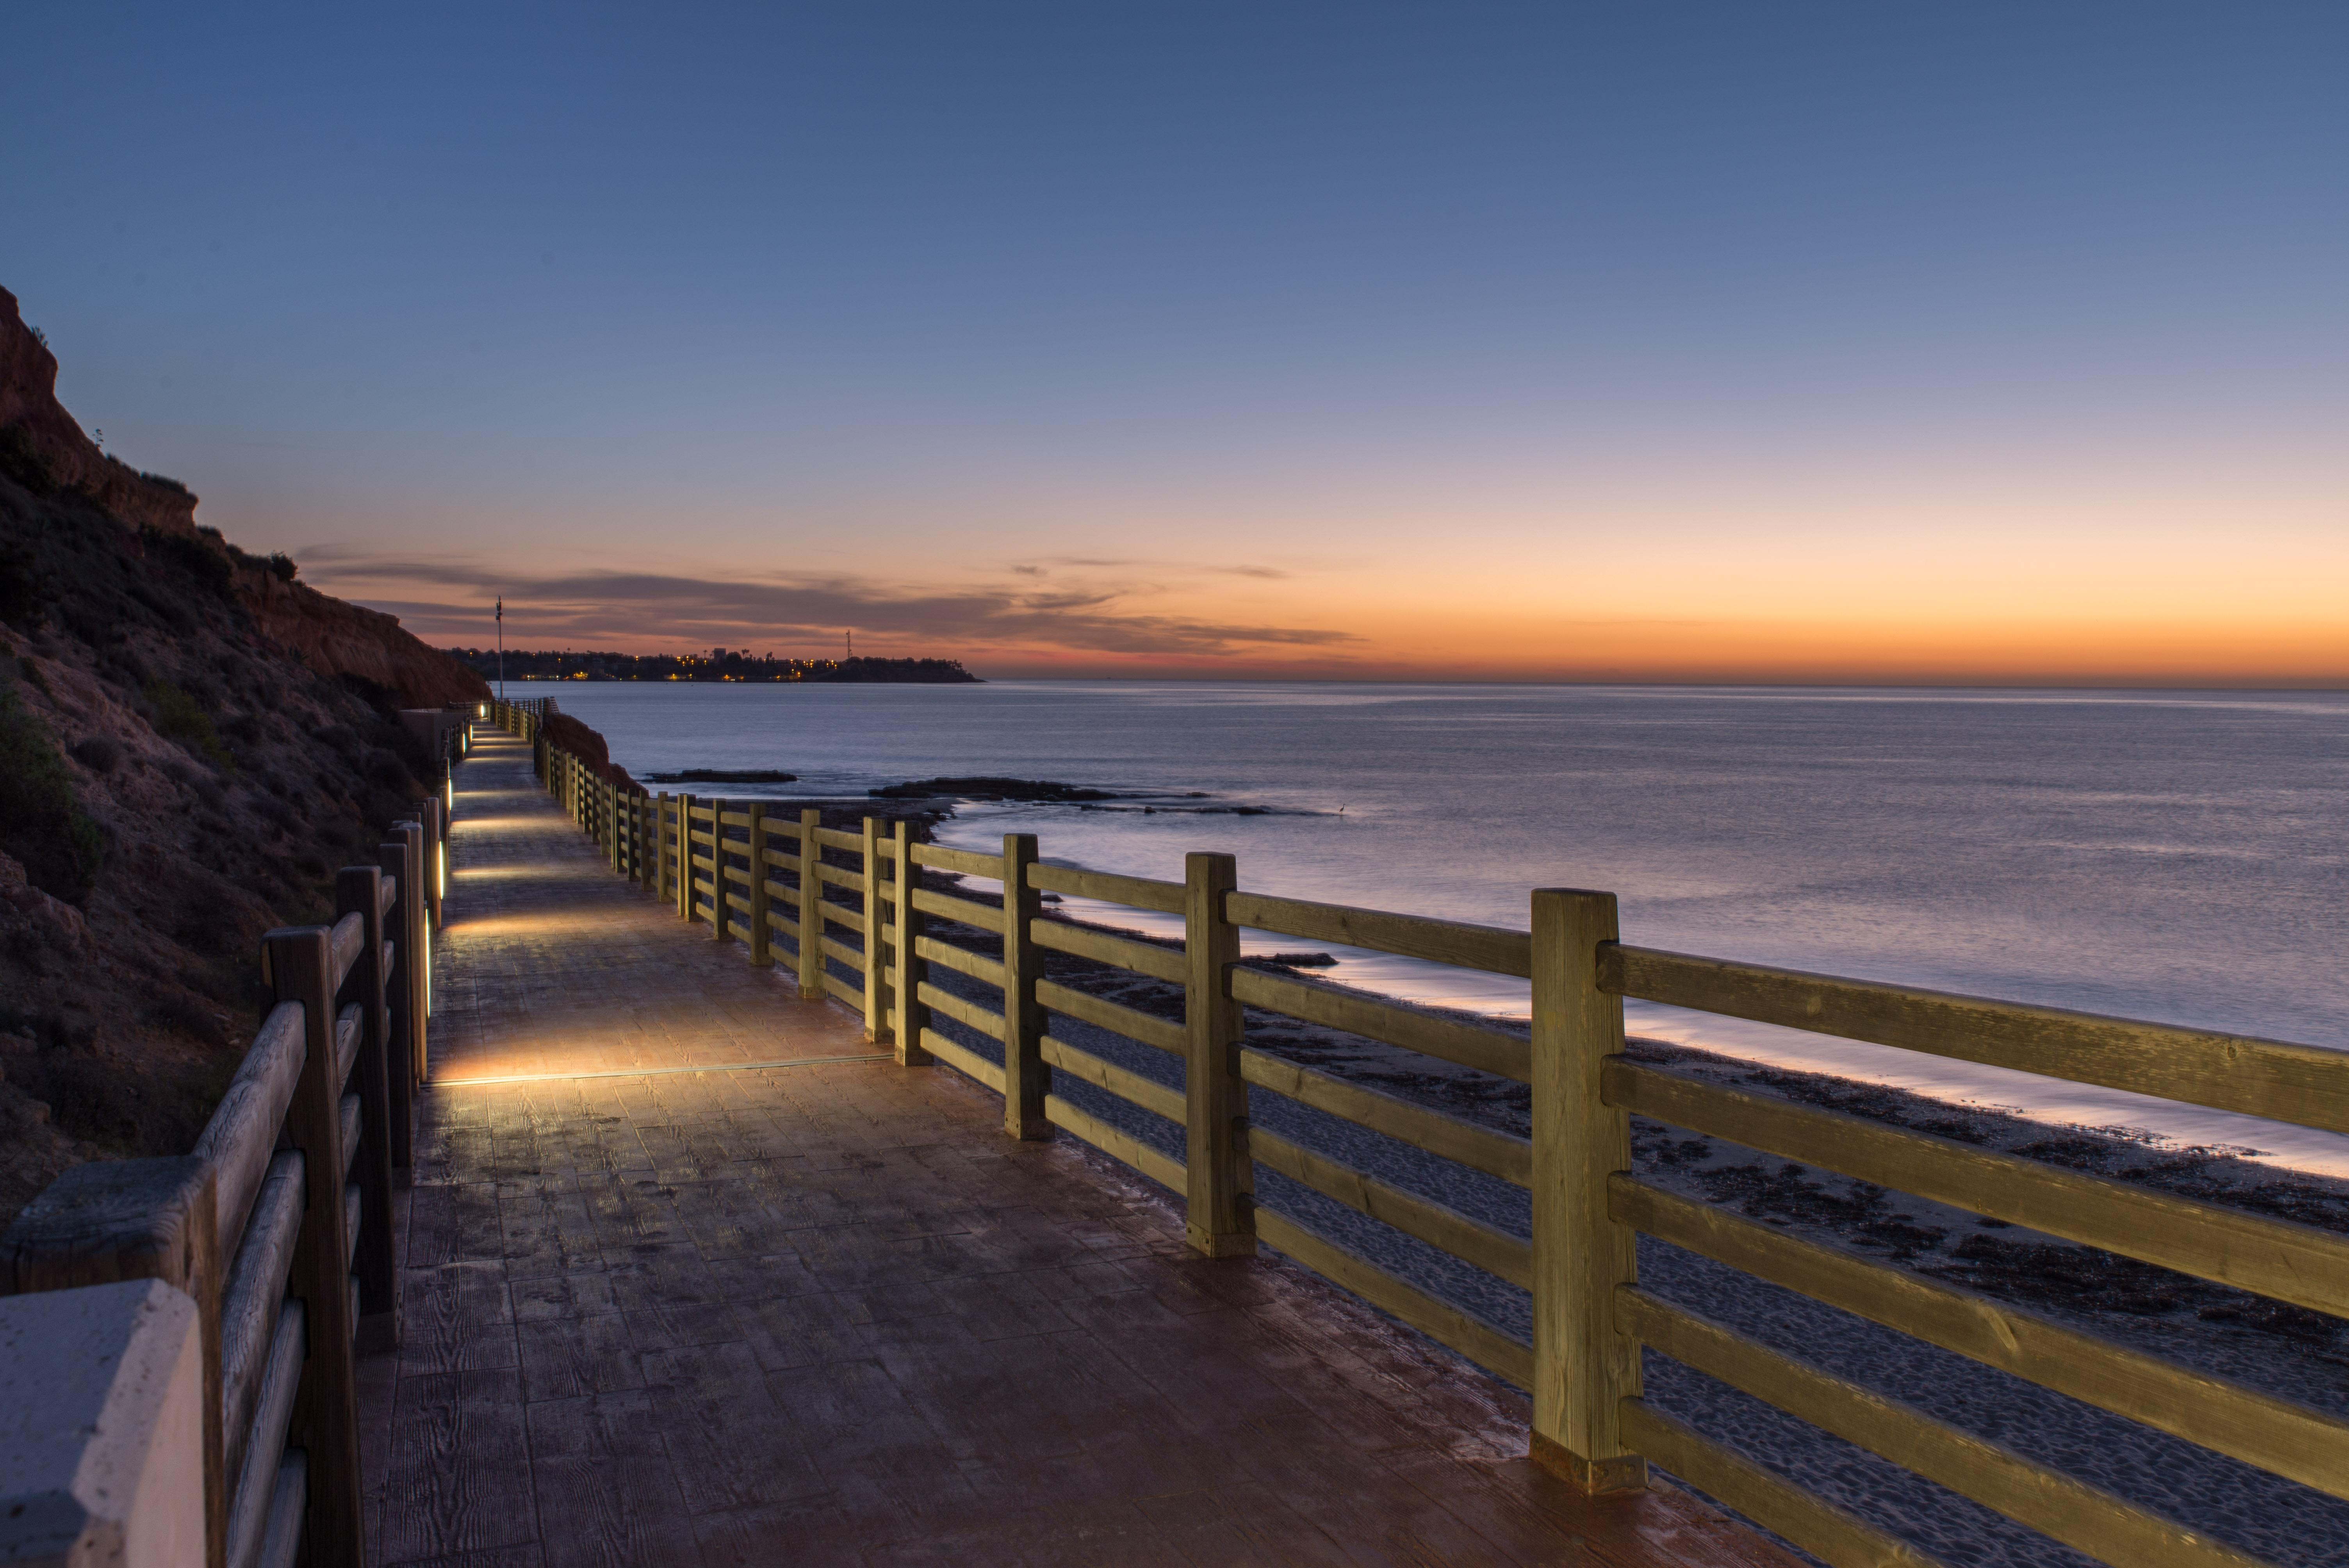 Wallpaper : sunlight, landscape, 500px, sunset, sea, night